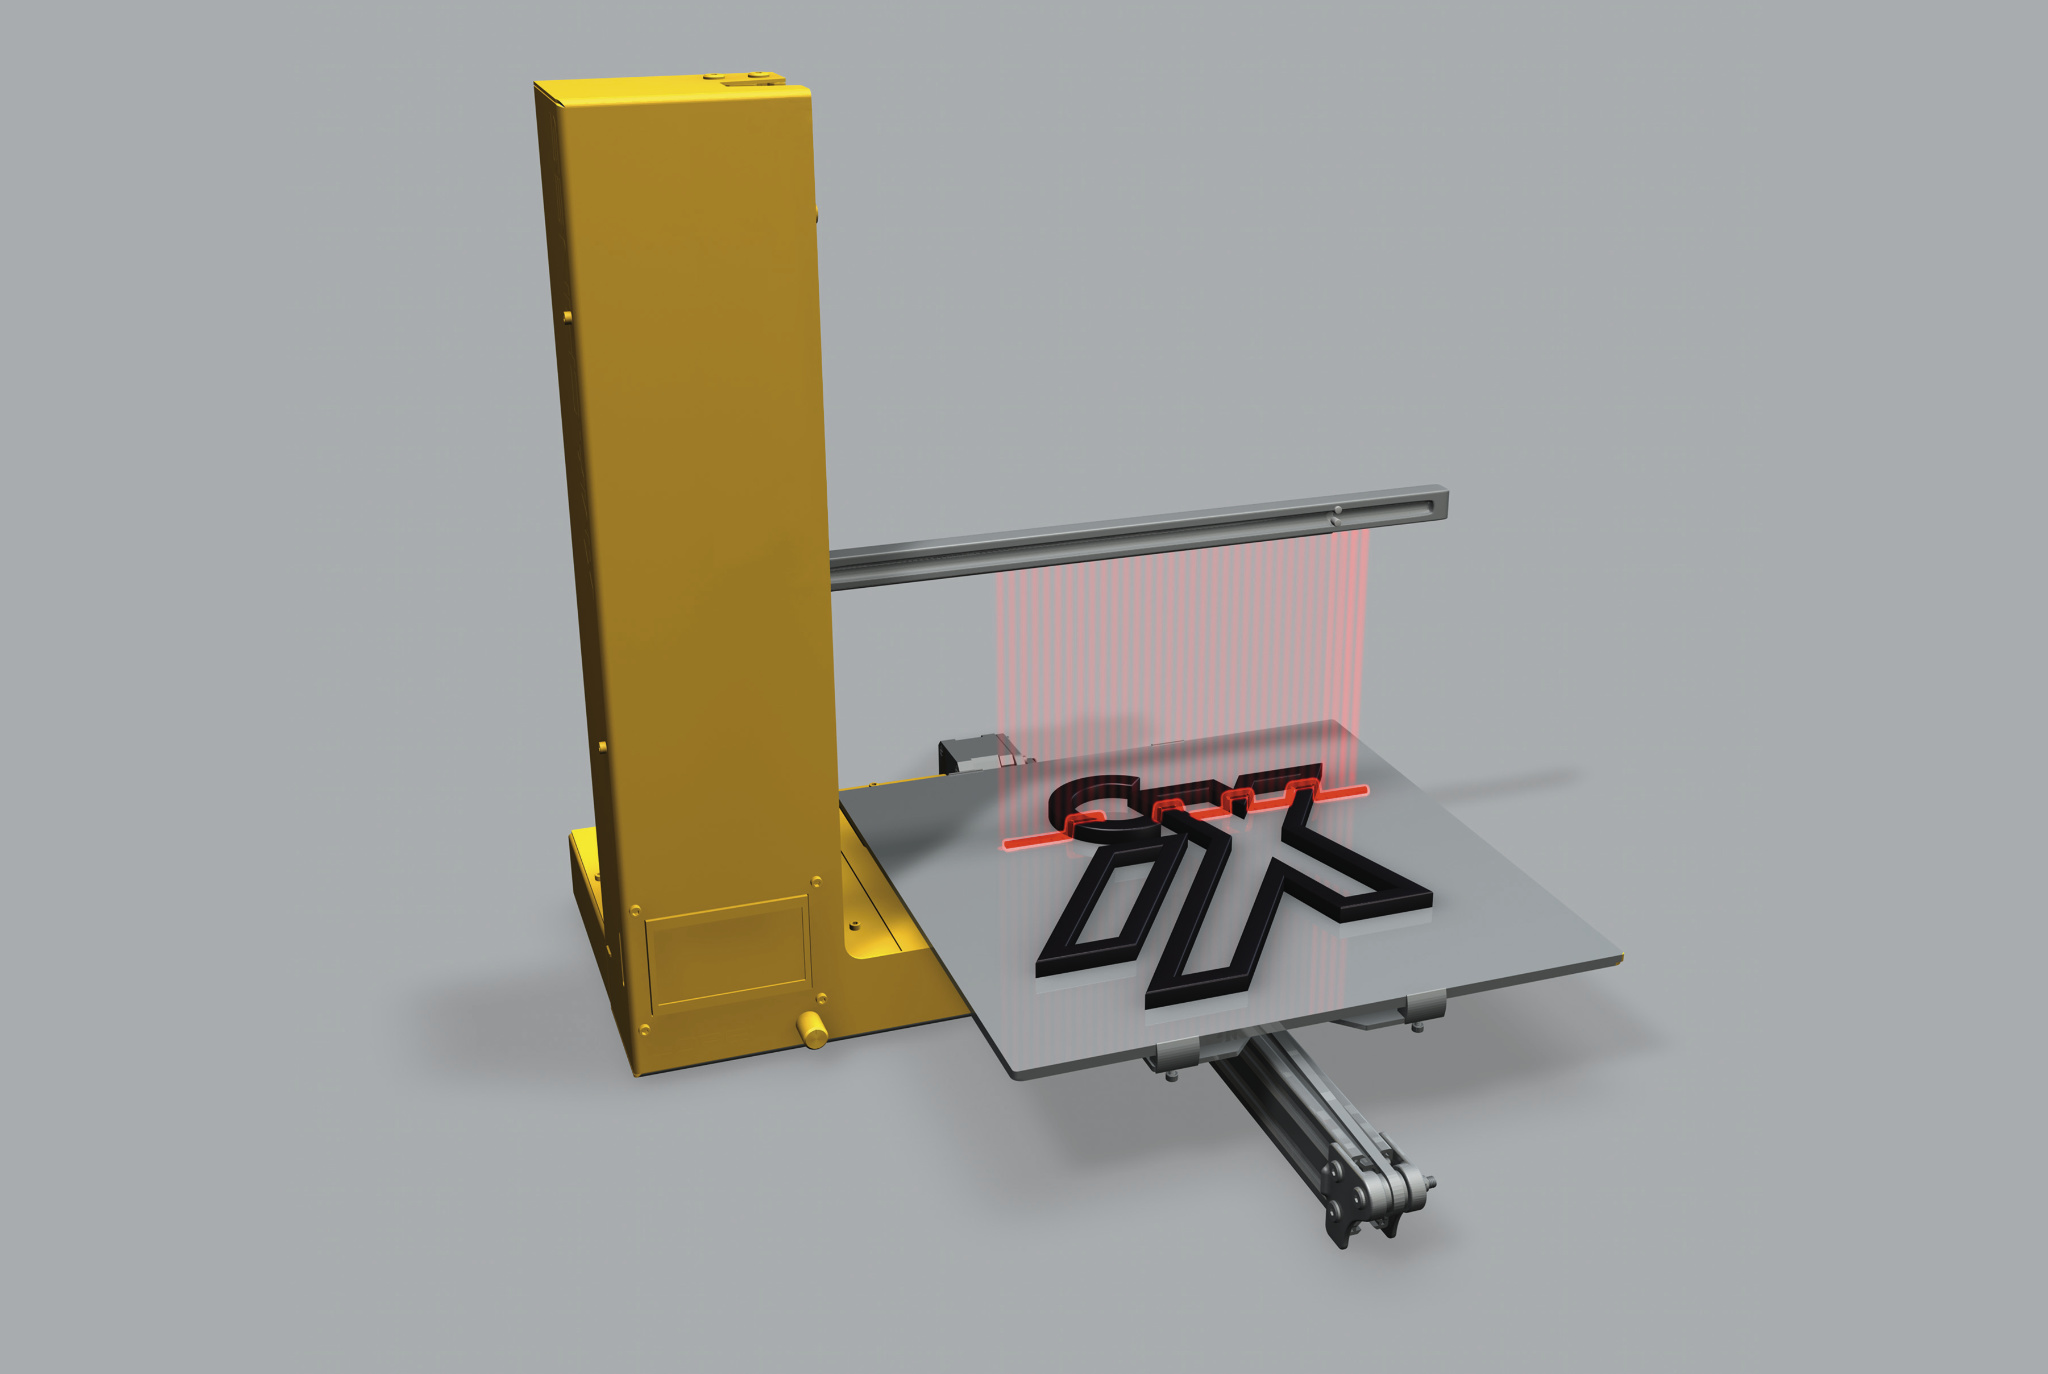 3D-Druck-Tutorial, Teil 1: 3D-Scan mit Open-Source-Software